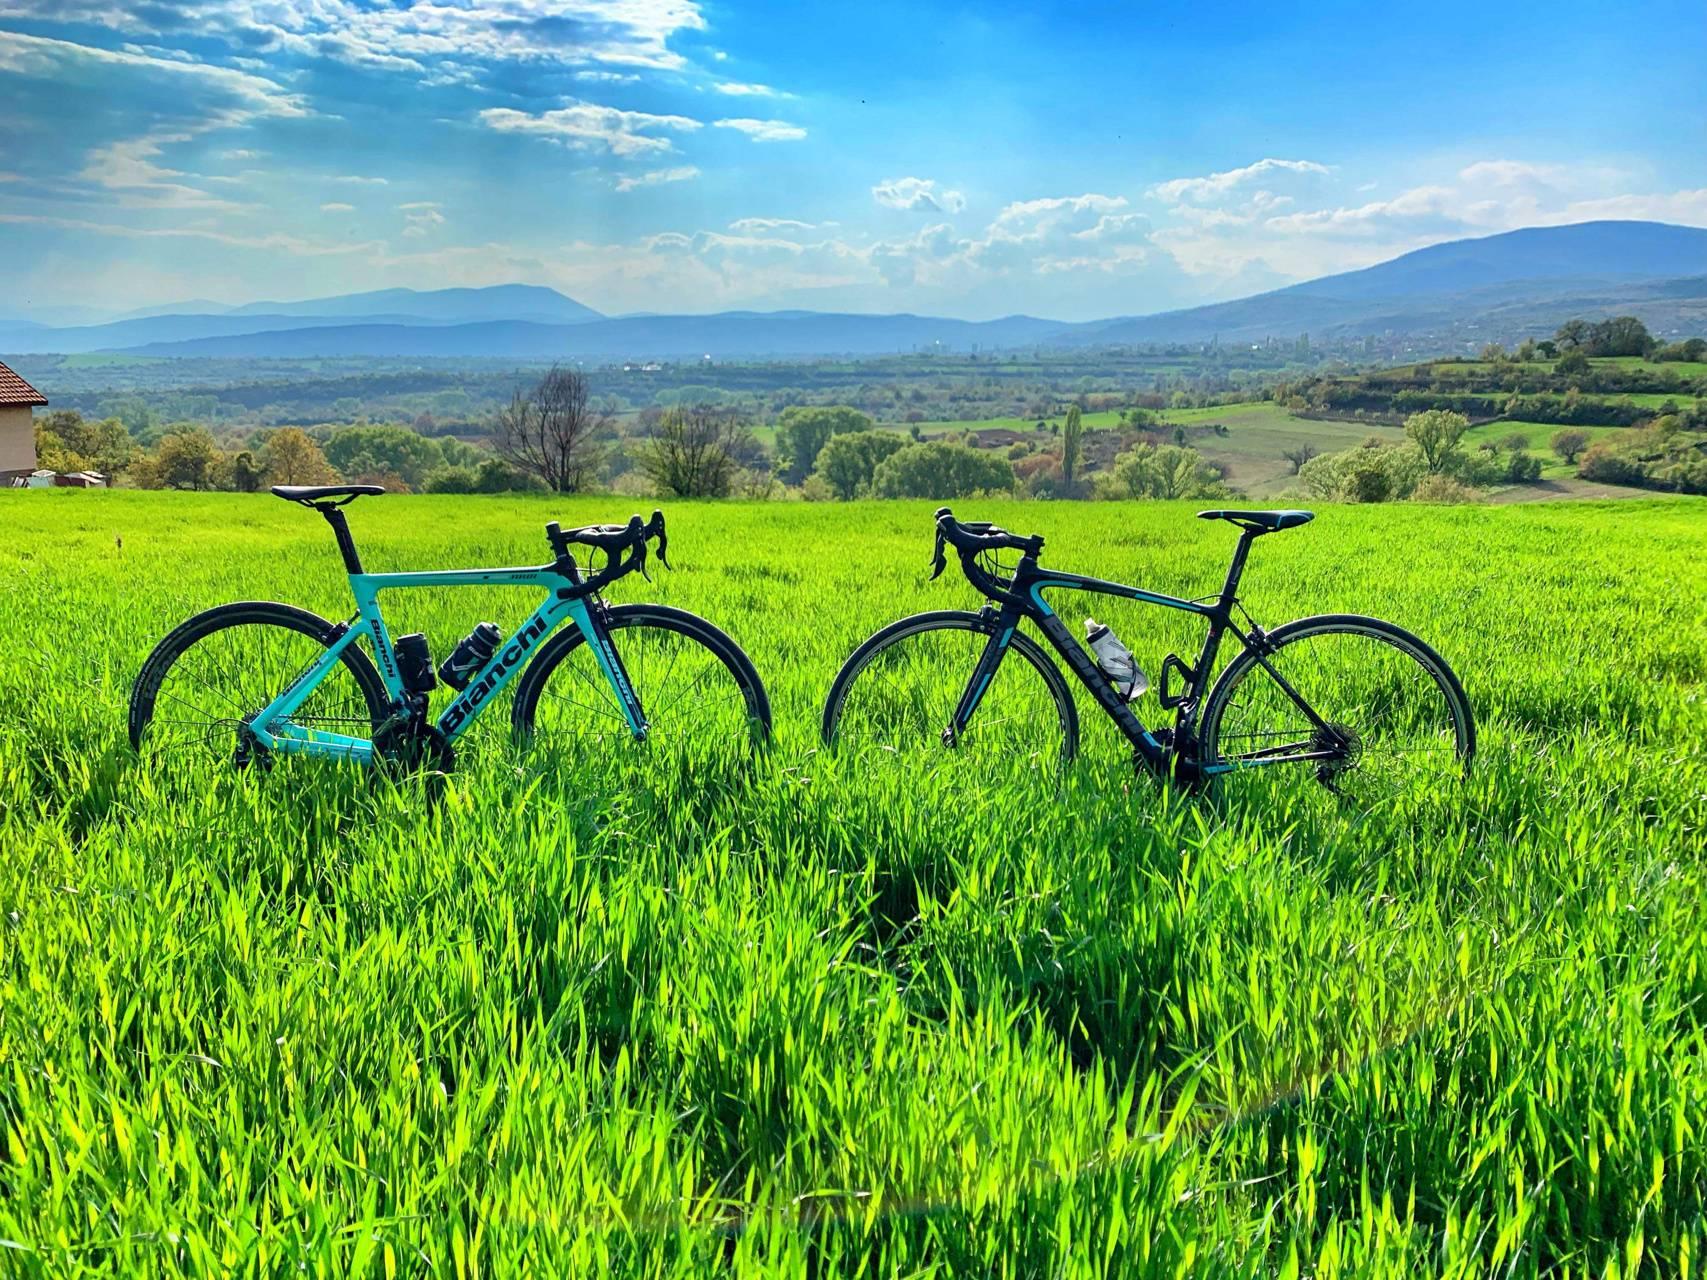 Bianchi Bicycle